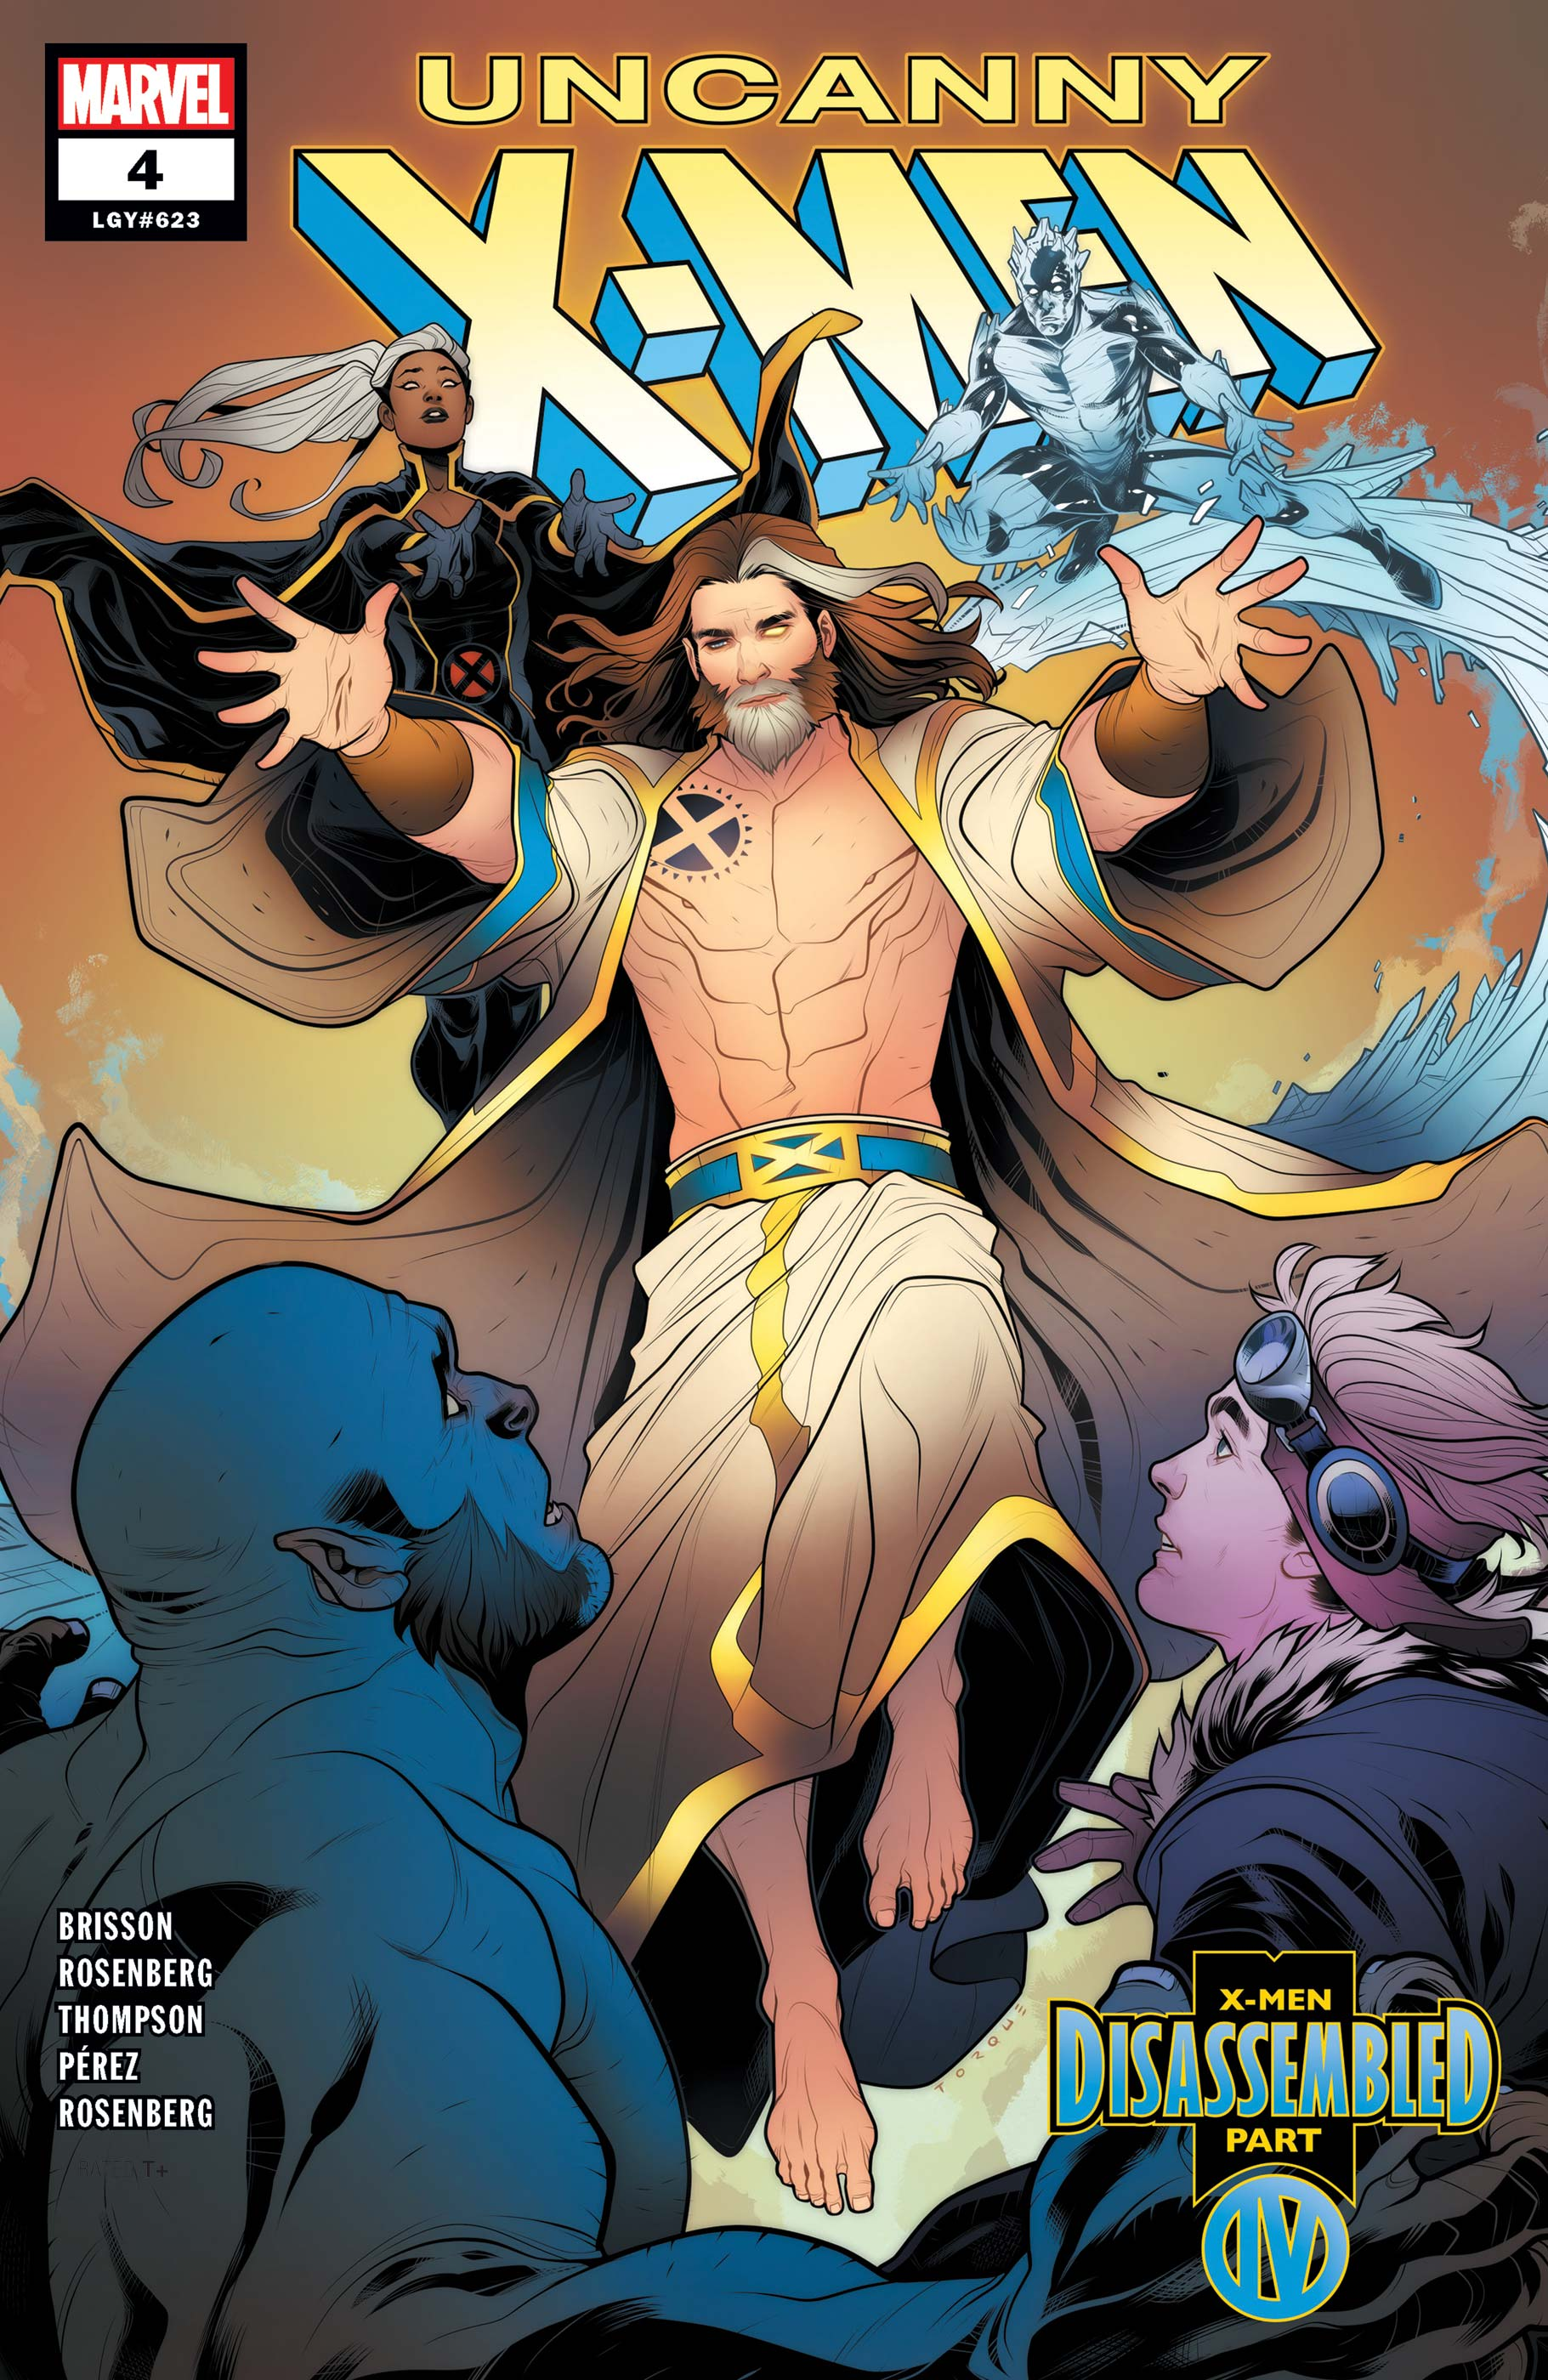 Uncanny X-Men (2018) #4